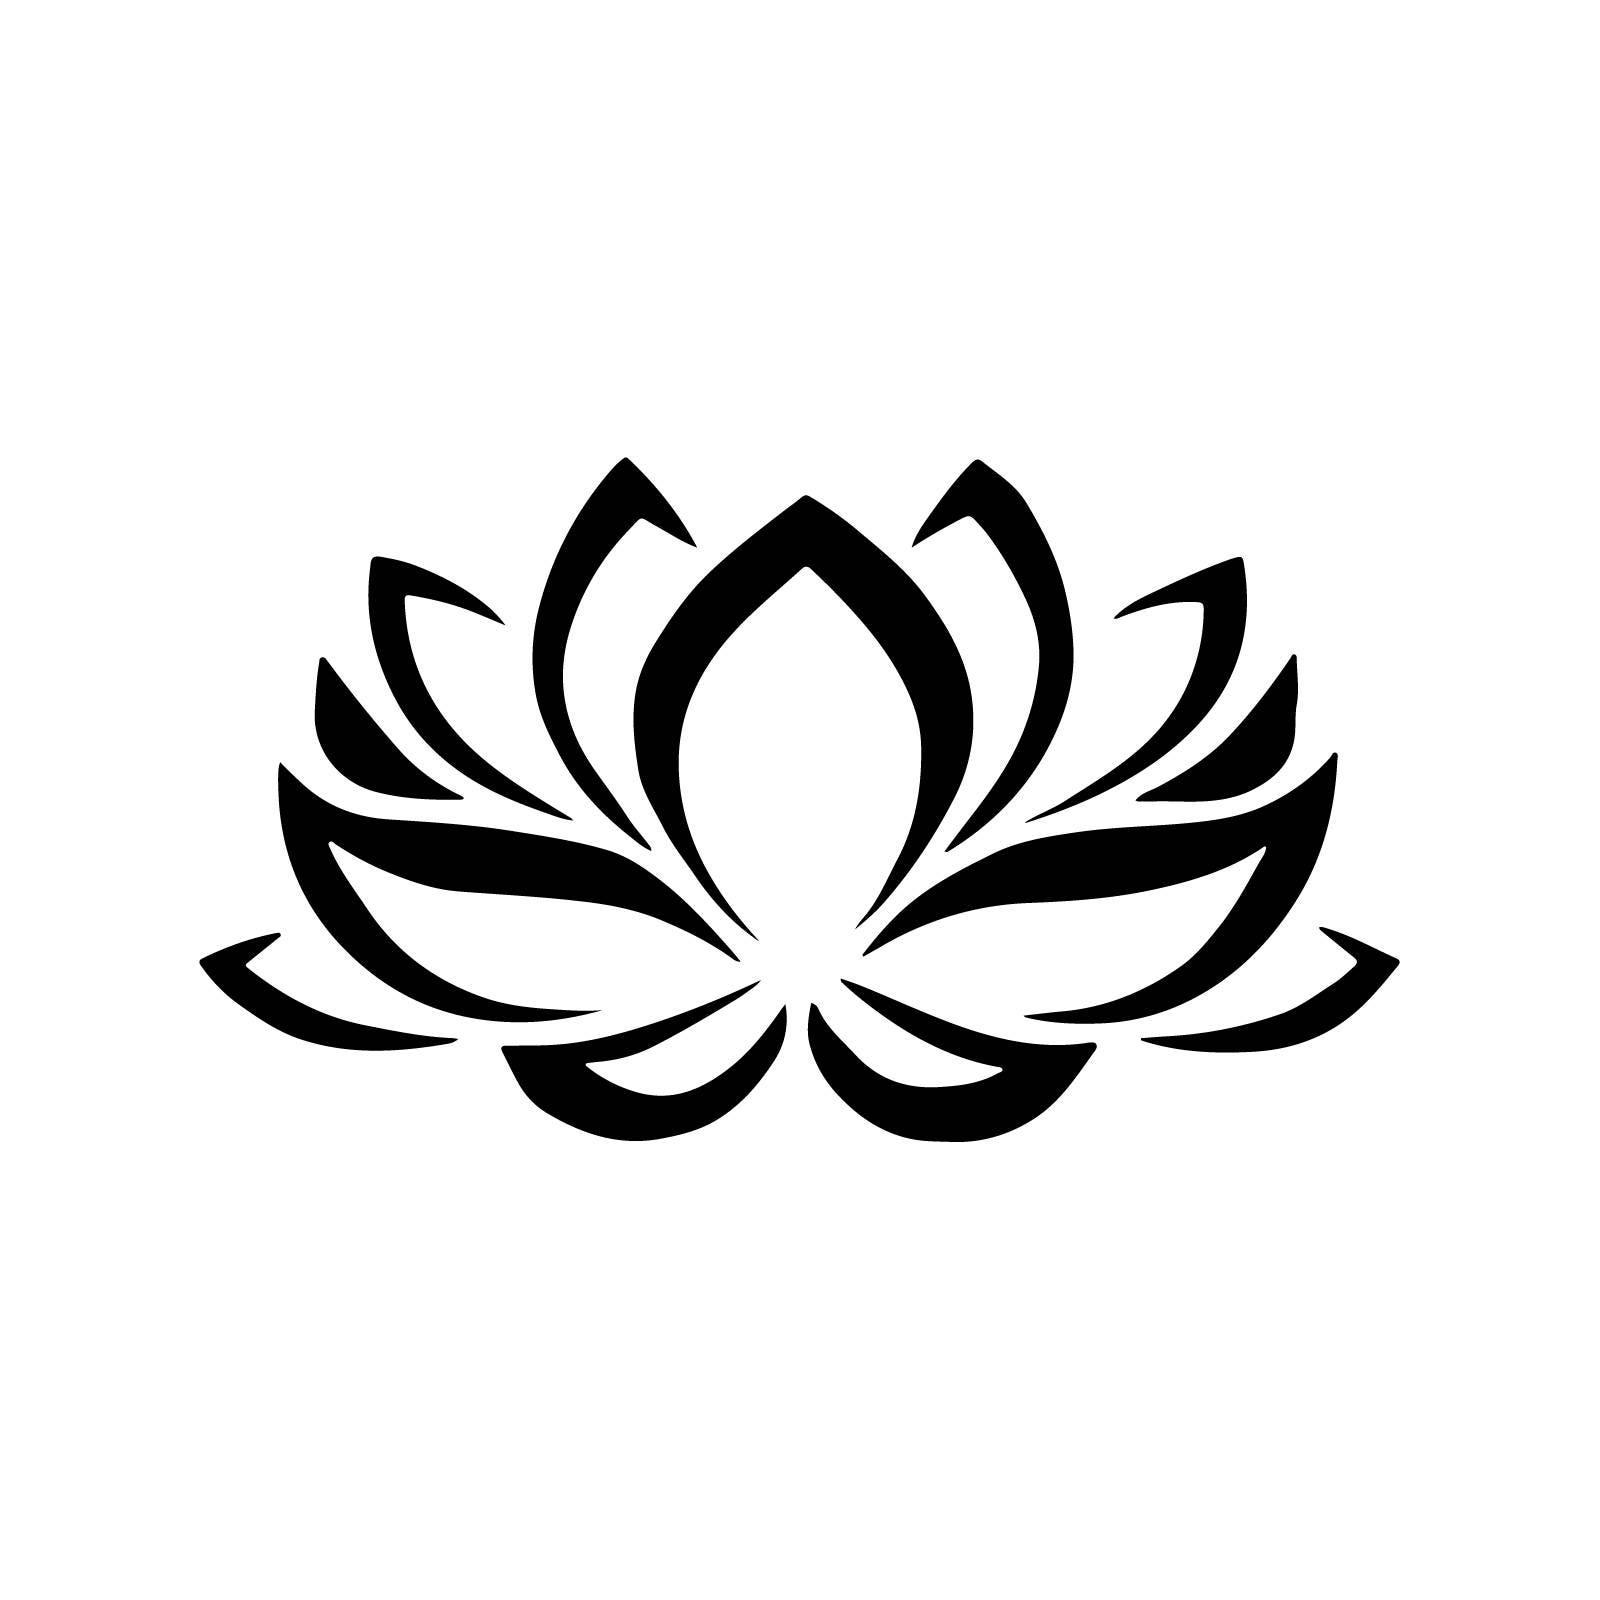 Stencil Floral Lotus Flower Stencil Decoration 5 Sizes Svg Pdf Etsy